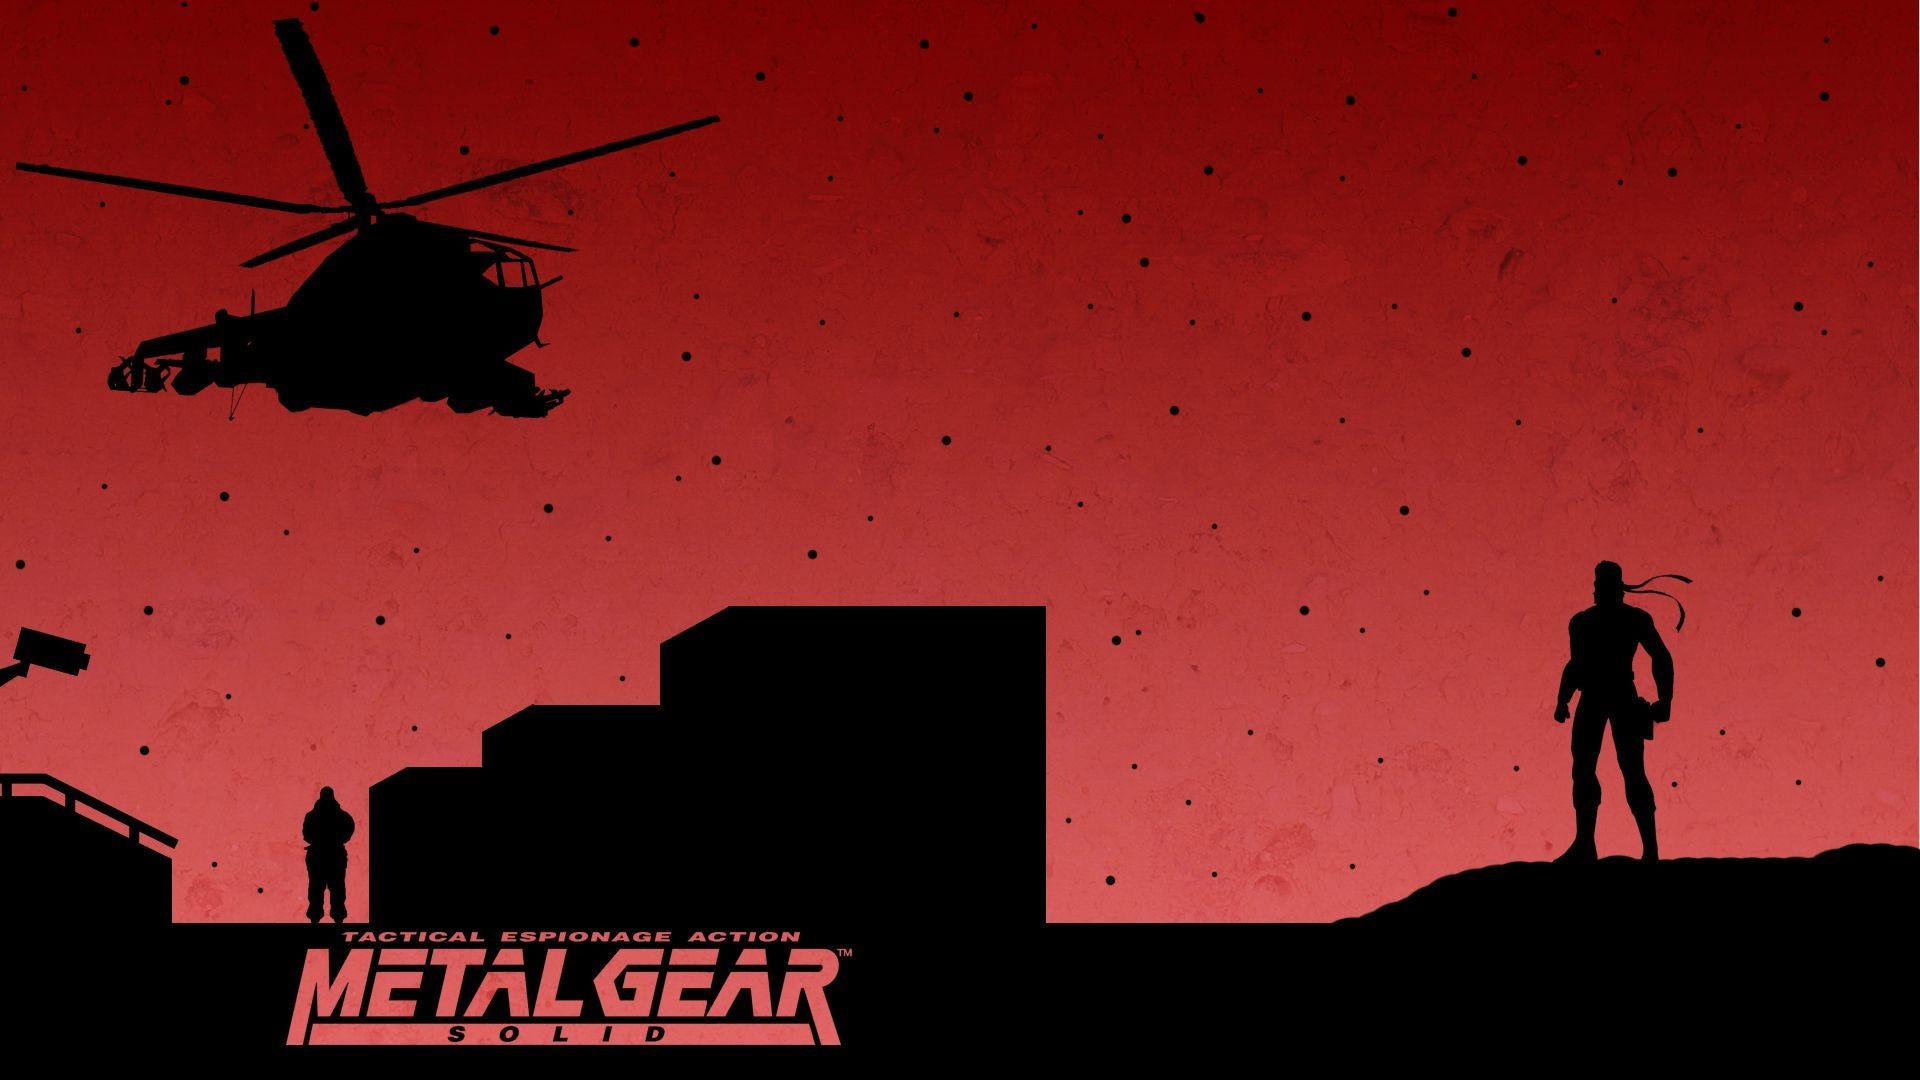 Metal Gear Solid Wallpaper Download Free Beautiful Full Hd